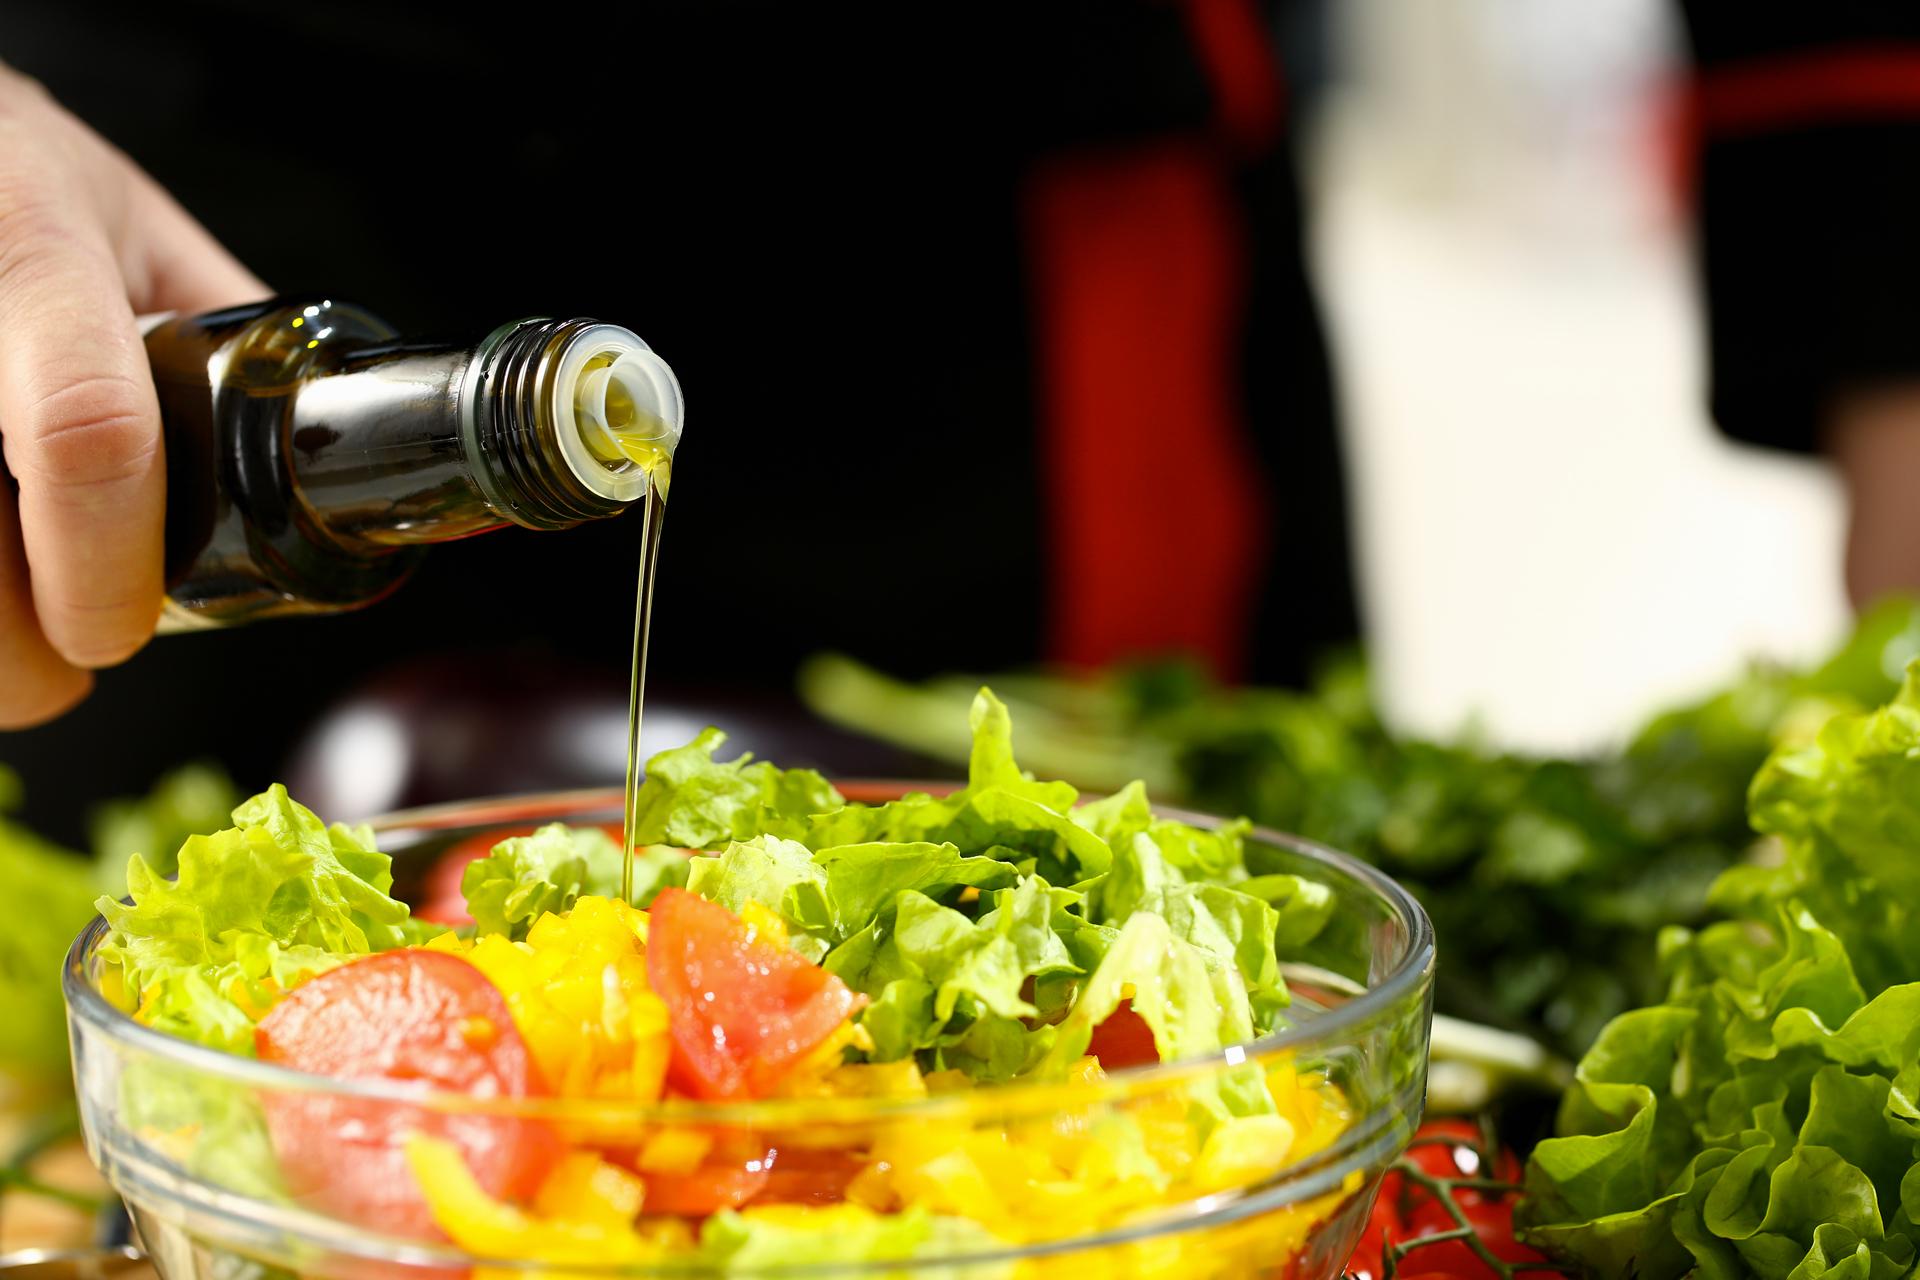 Benefici dell'olio extravergine d'oliva